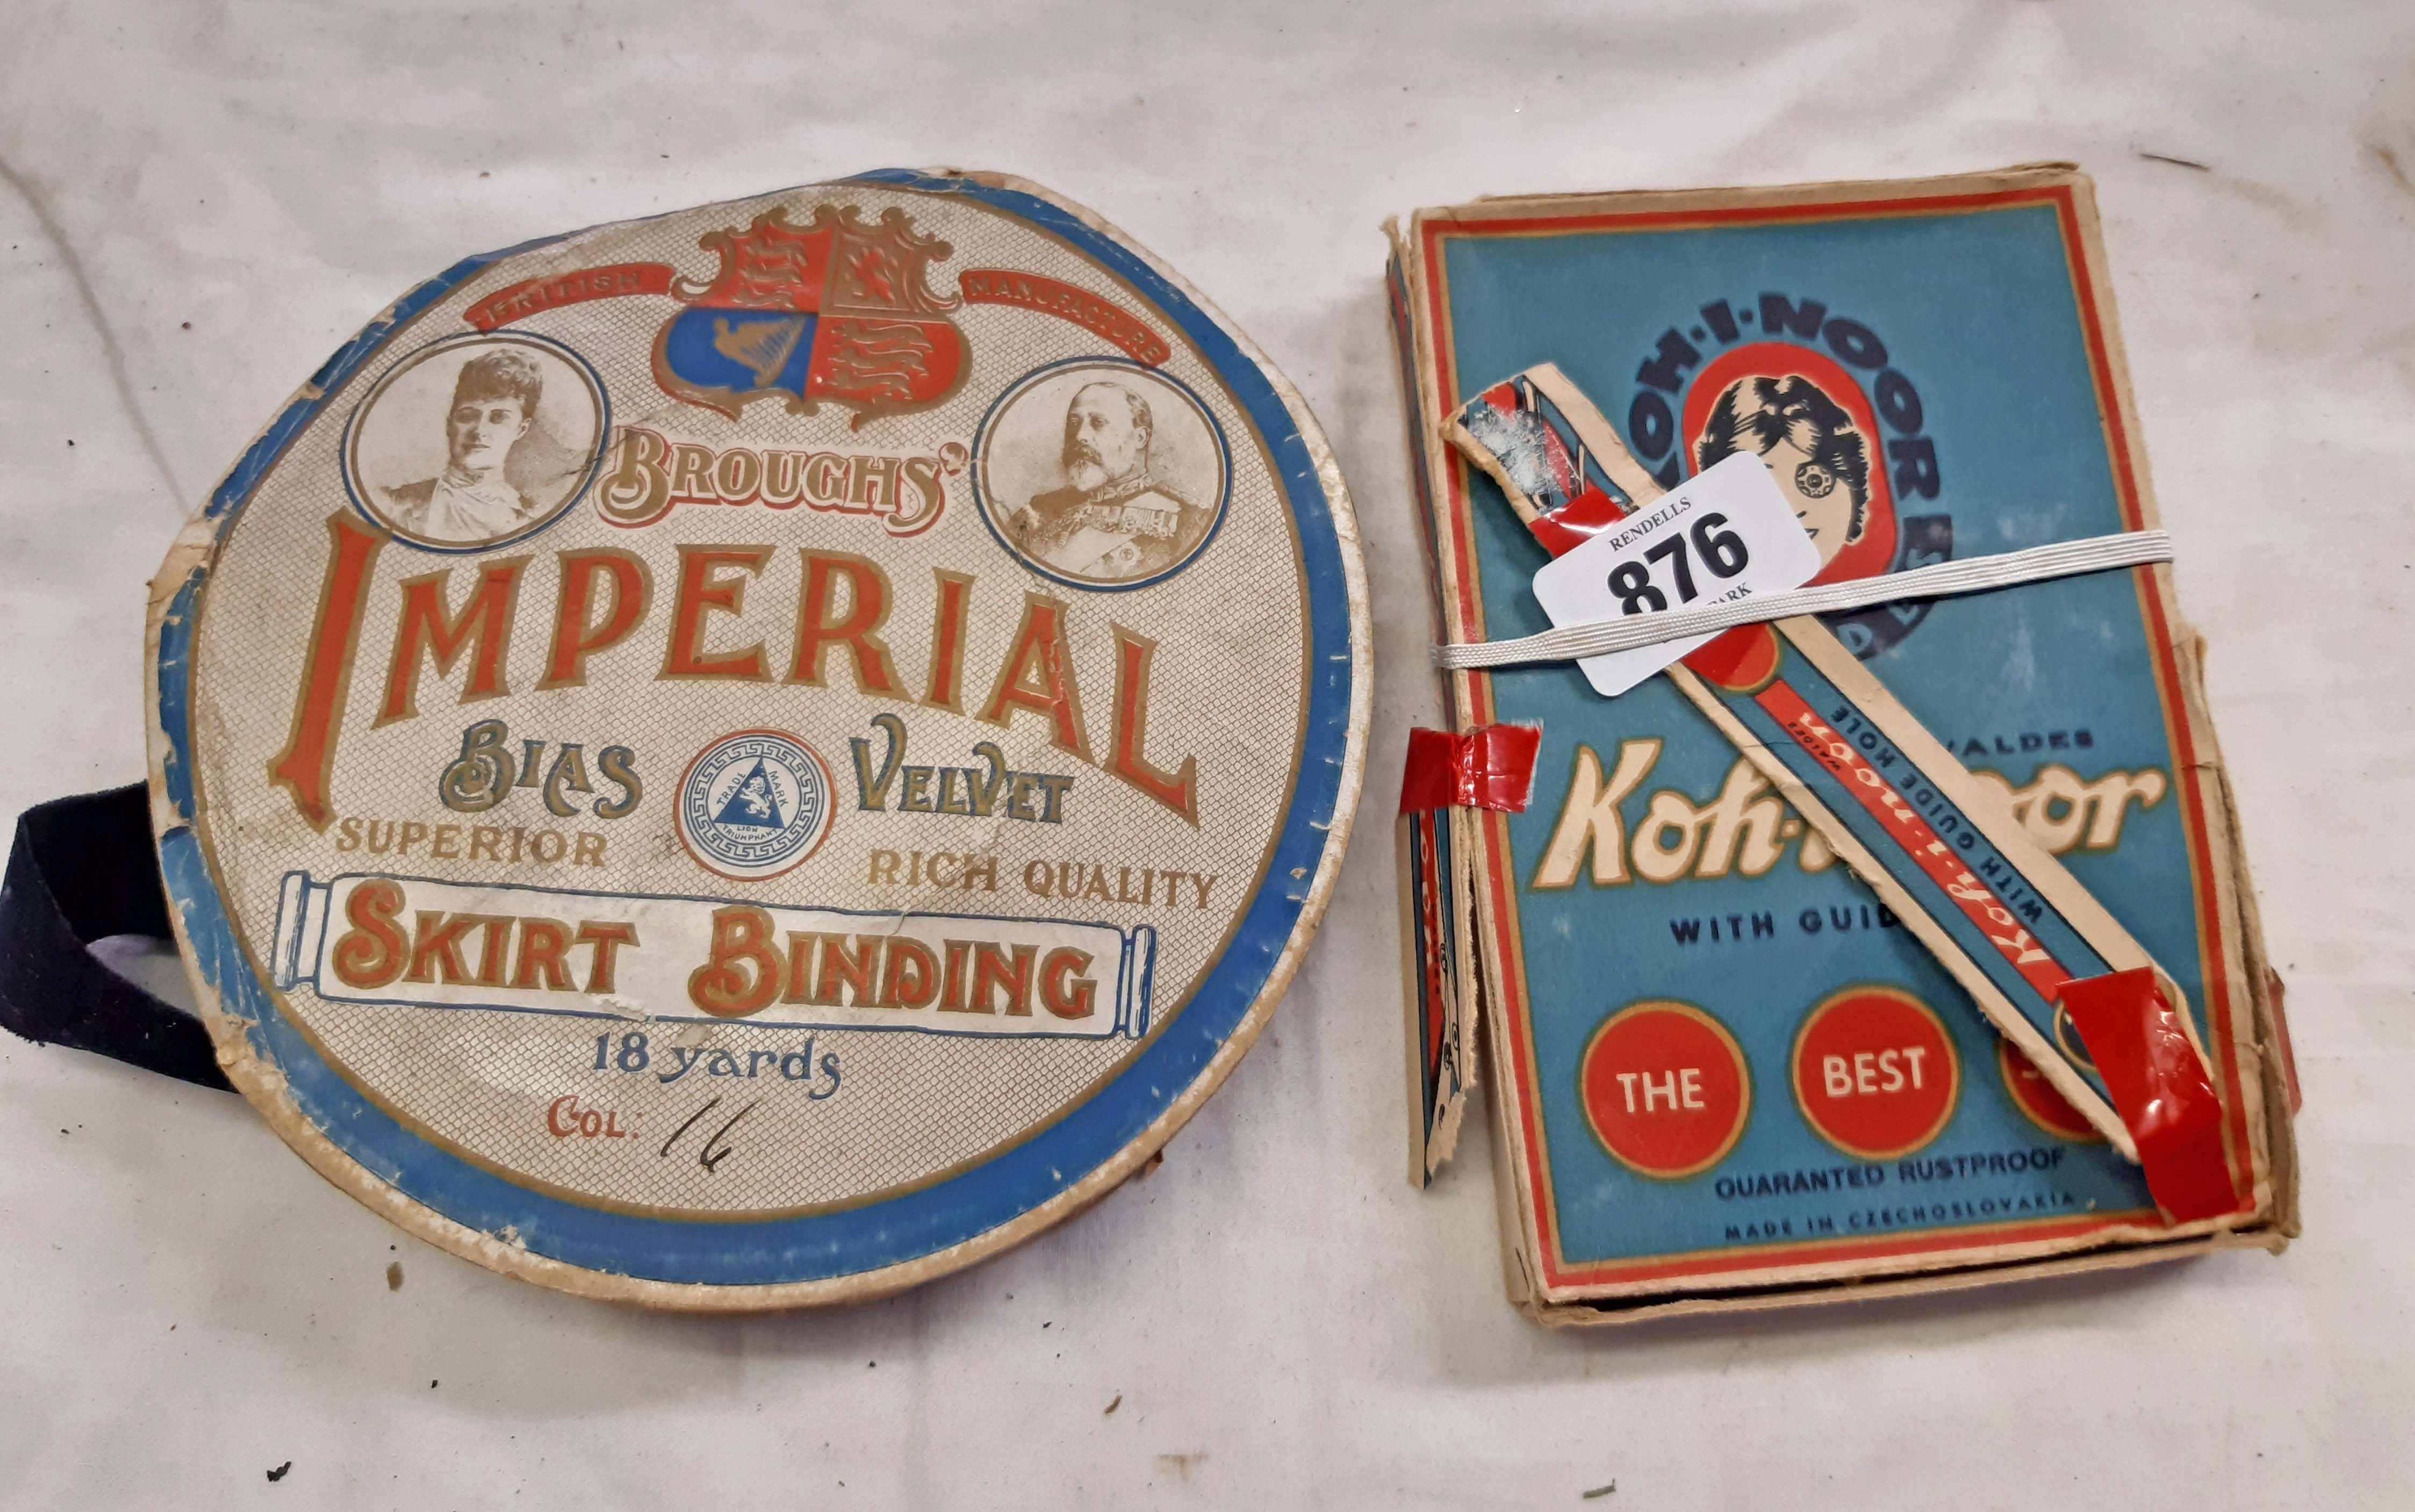 An early 20th Century roll of Broughs' Imperial bias velvet skirt binding on original packaging reel